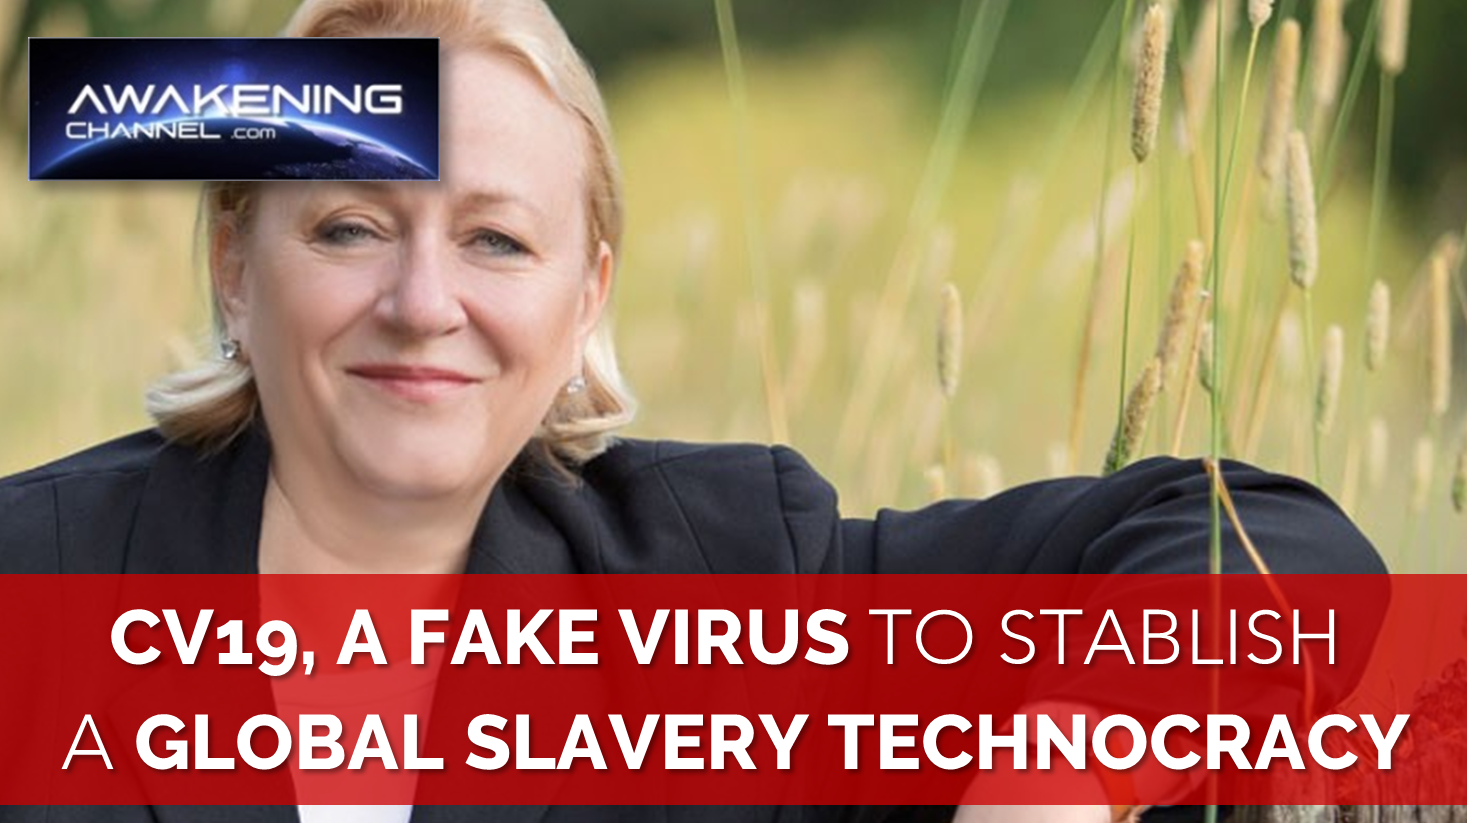 CV19, a Fake Virus, a Coup D'état to Stablish a Global Slavery Technocracy